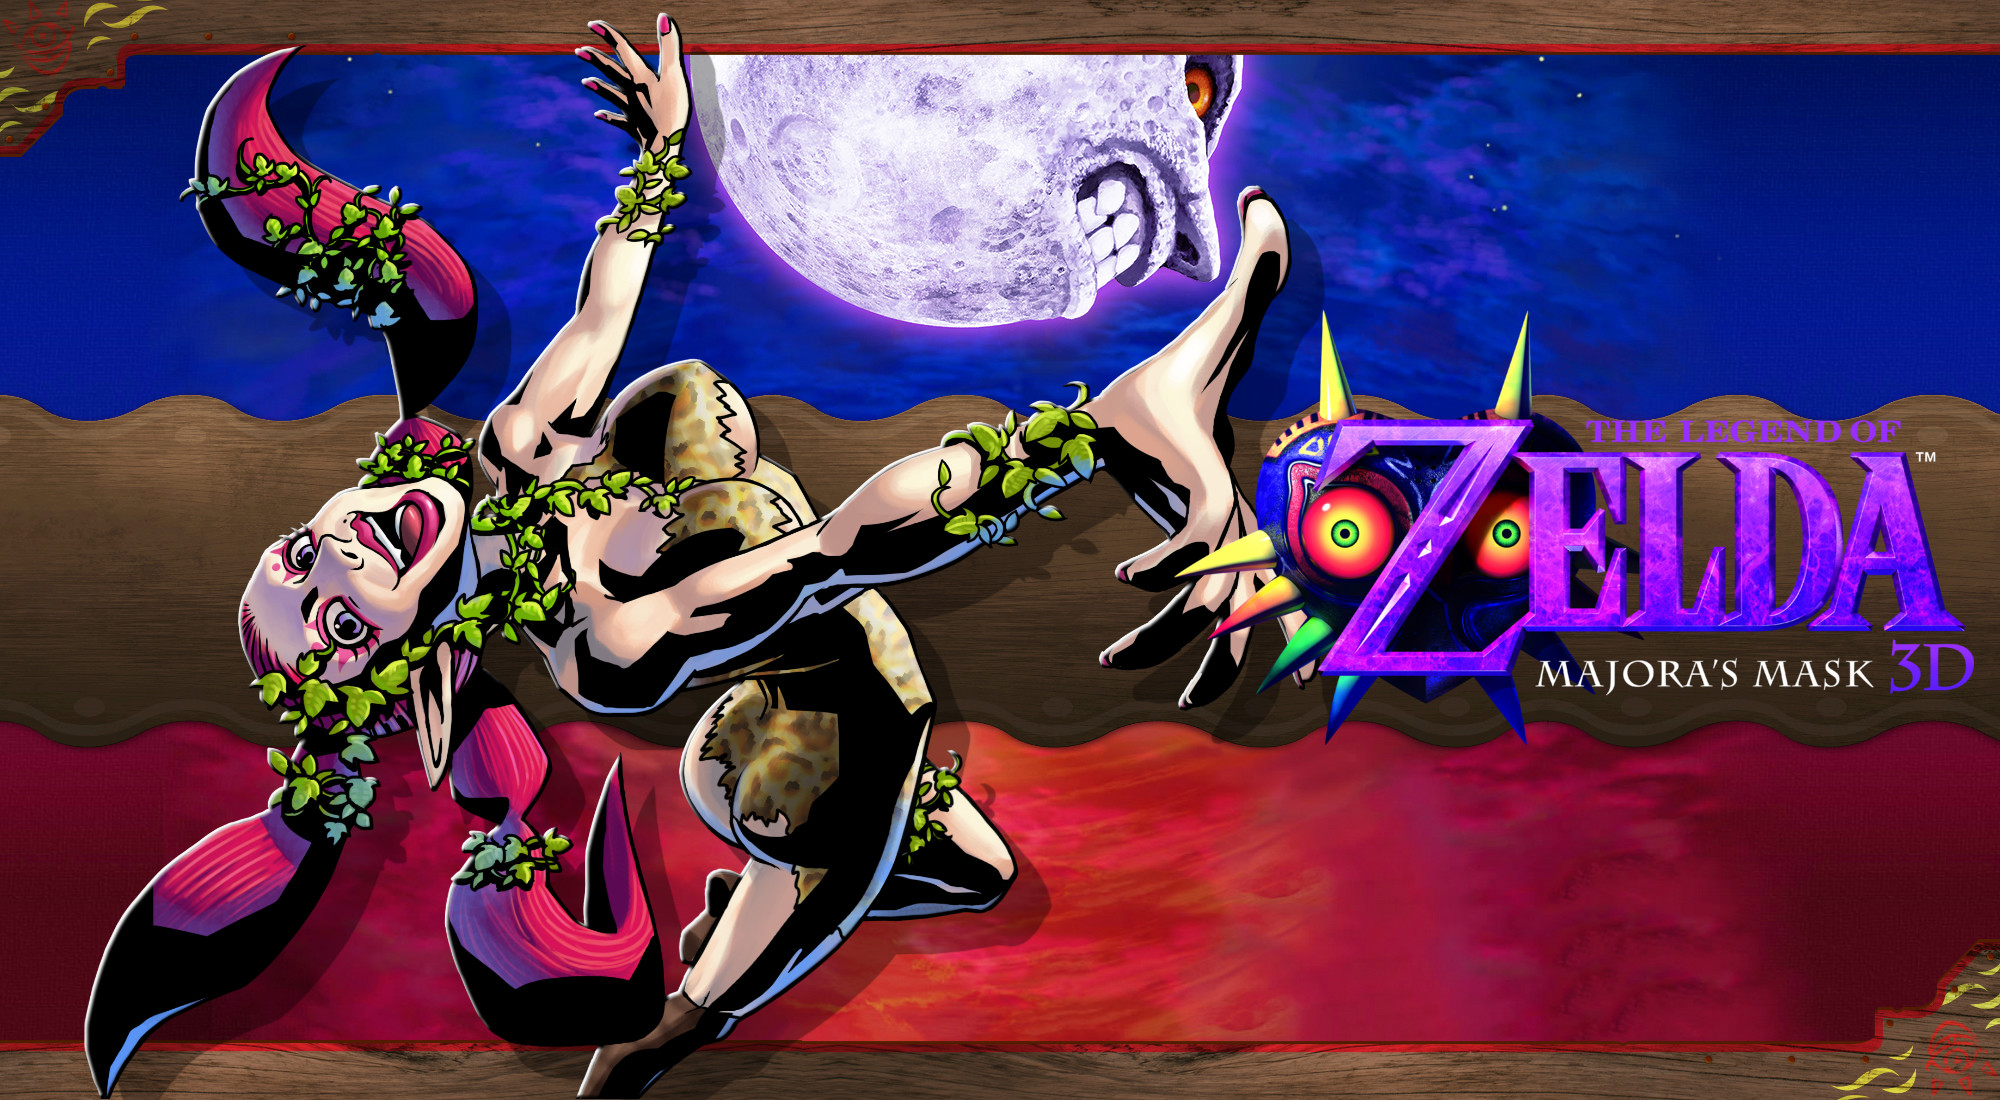 … Majora's Mask 3D Wallpaper – Great Fairy by DaKidGaming